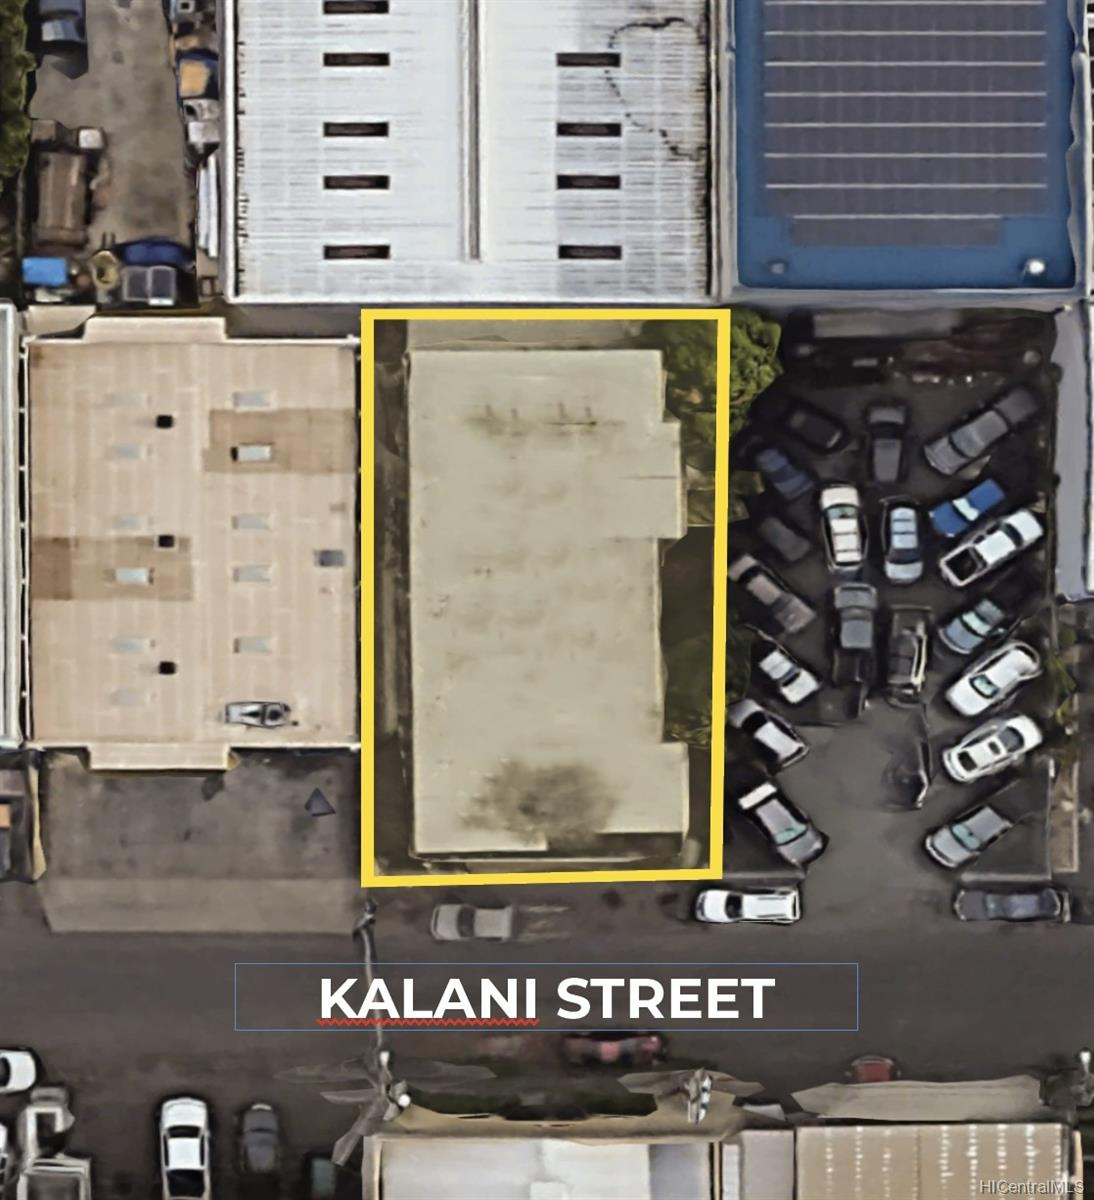 1720 Kalani Street Honolulu - Multi-family - photo 4 of 23